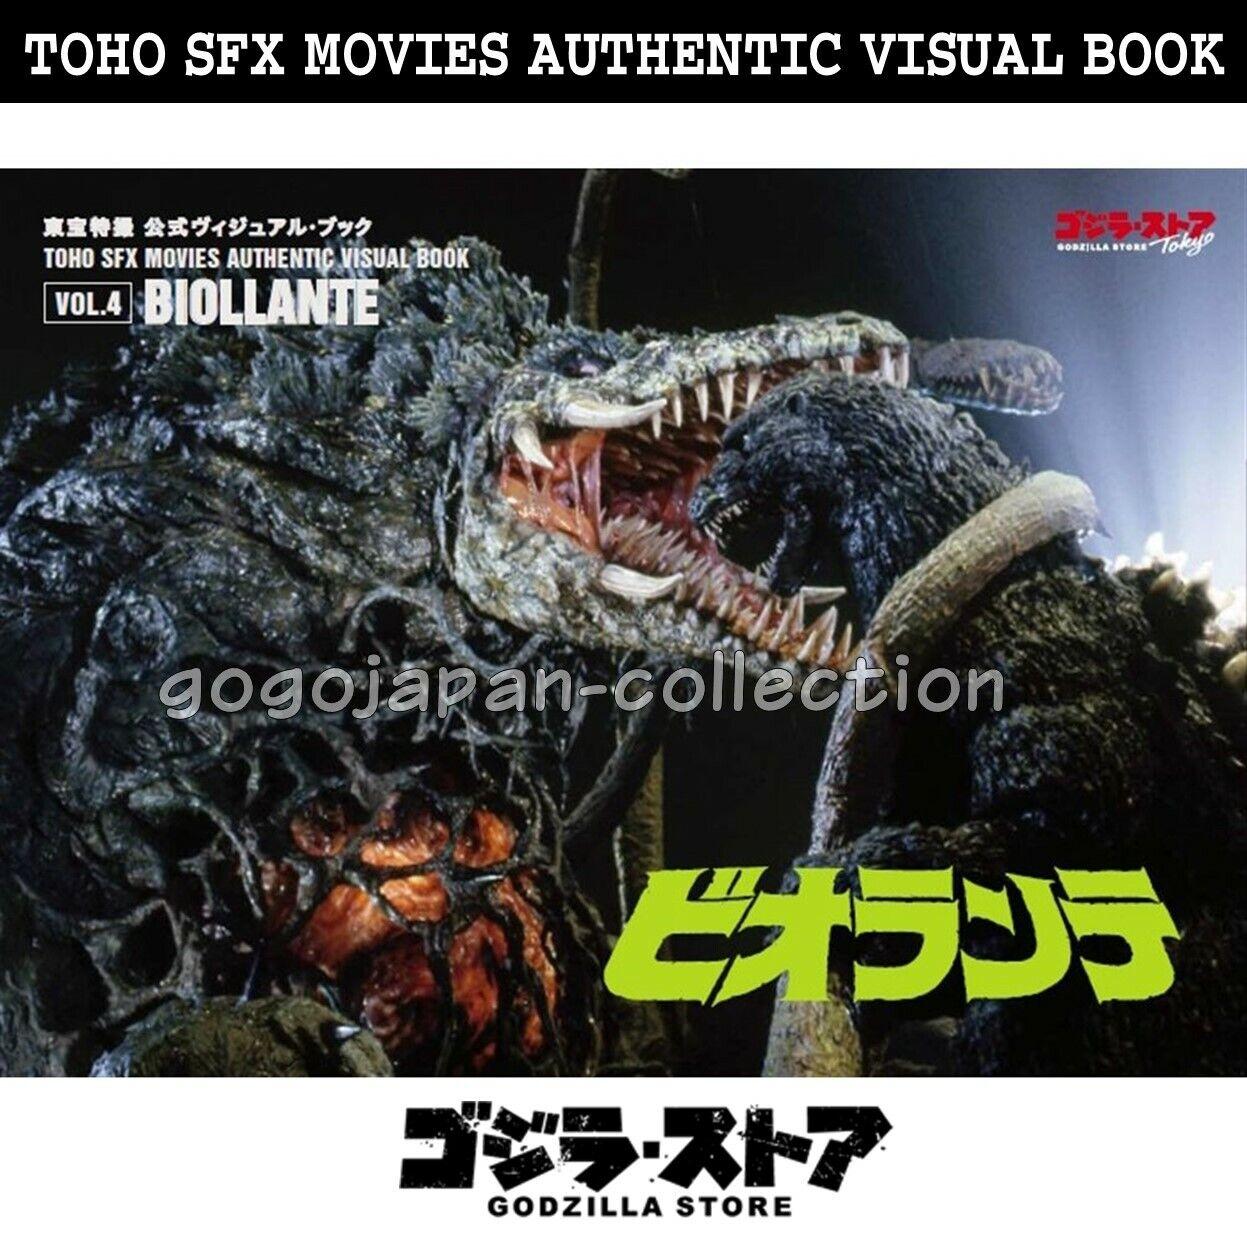 GODZILLA STORE LIMITED TOHO SFX MOVIES AUTHENTIC VISUAL BOOK VOL.4 BIOLLANTE mo